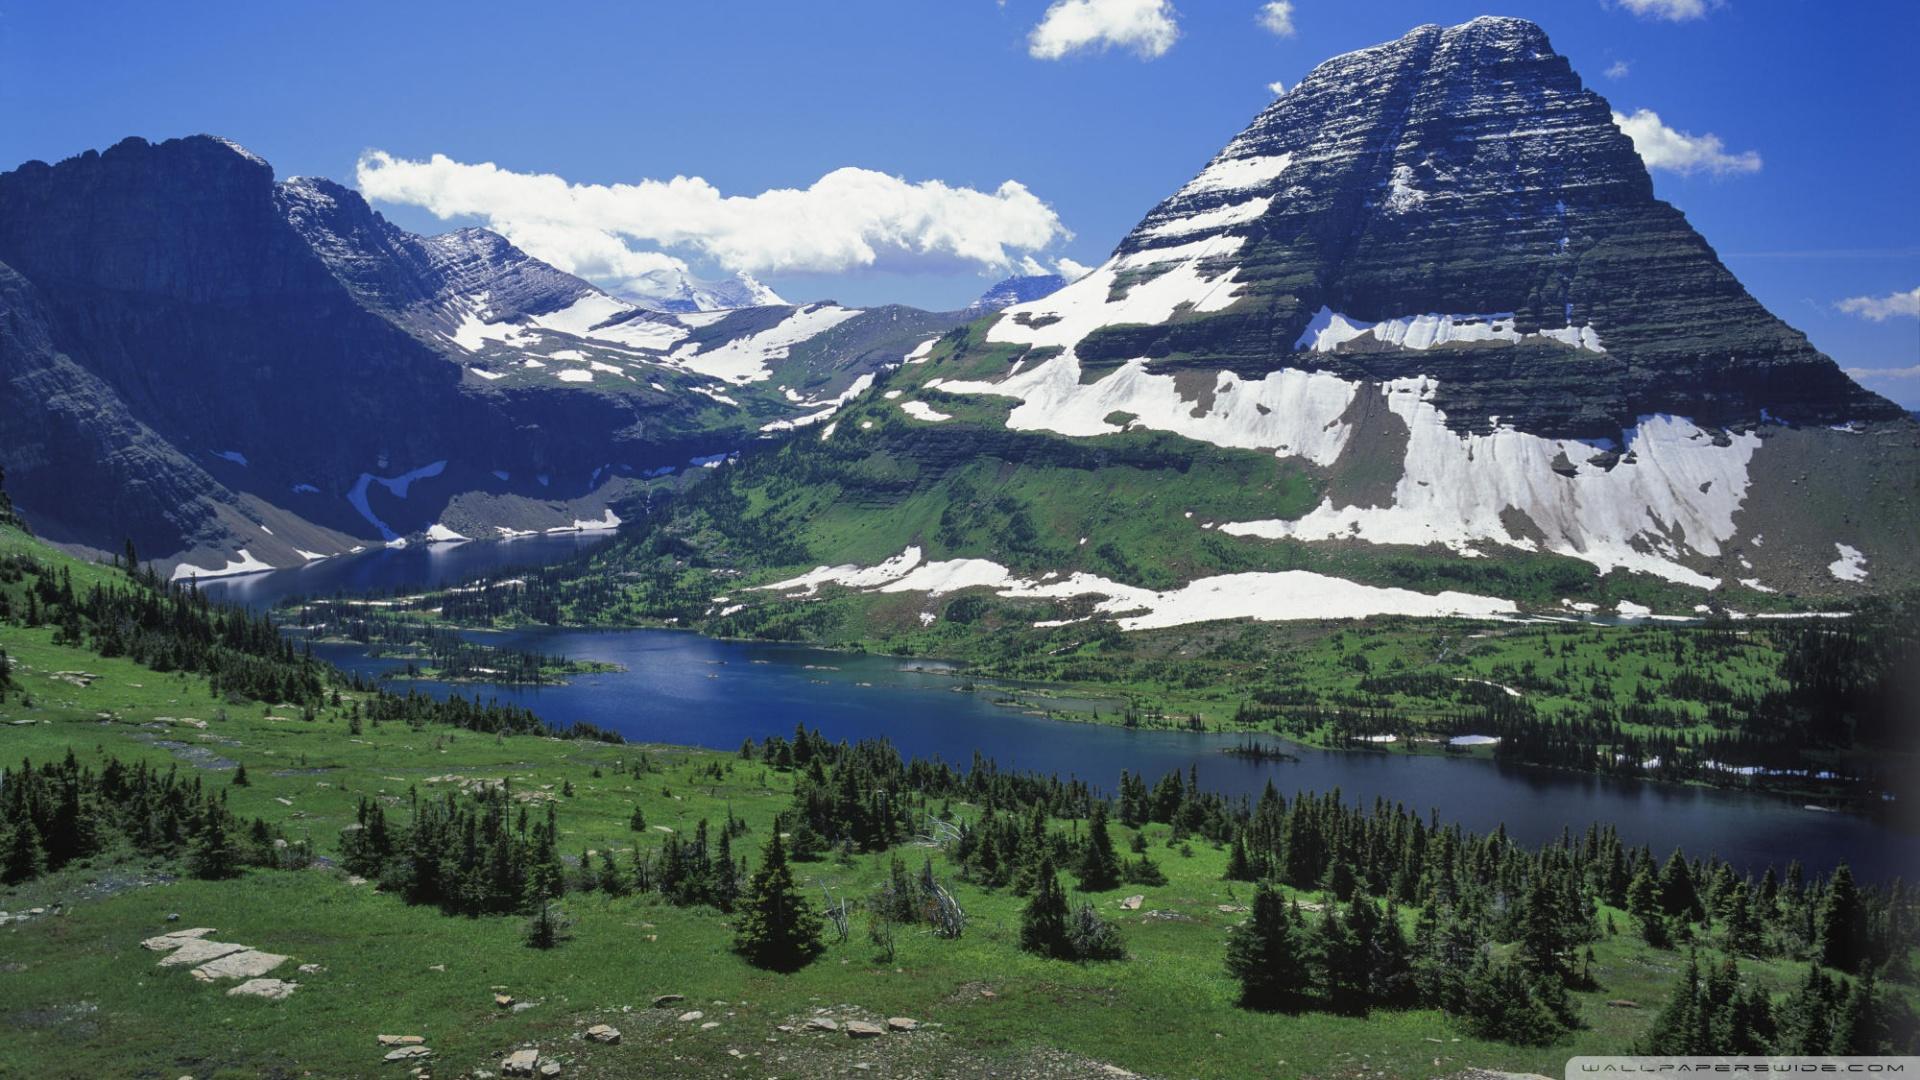 Glacier National Park Montana Wallpaper 1920x1080 Wallpoper 437220 1920x1080